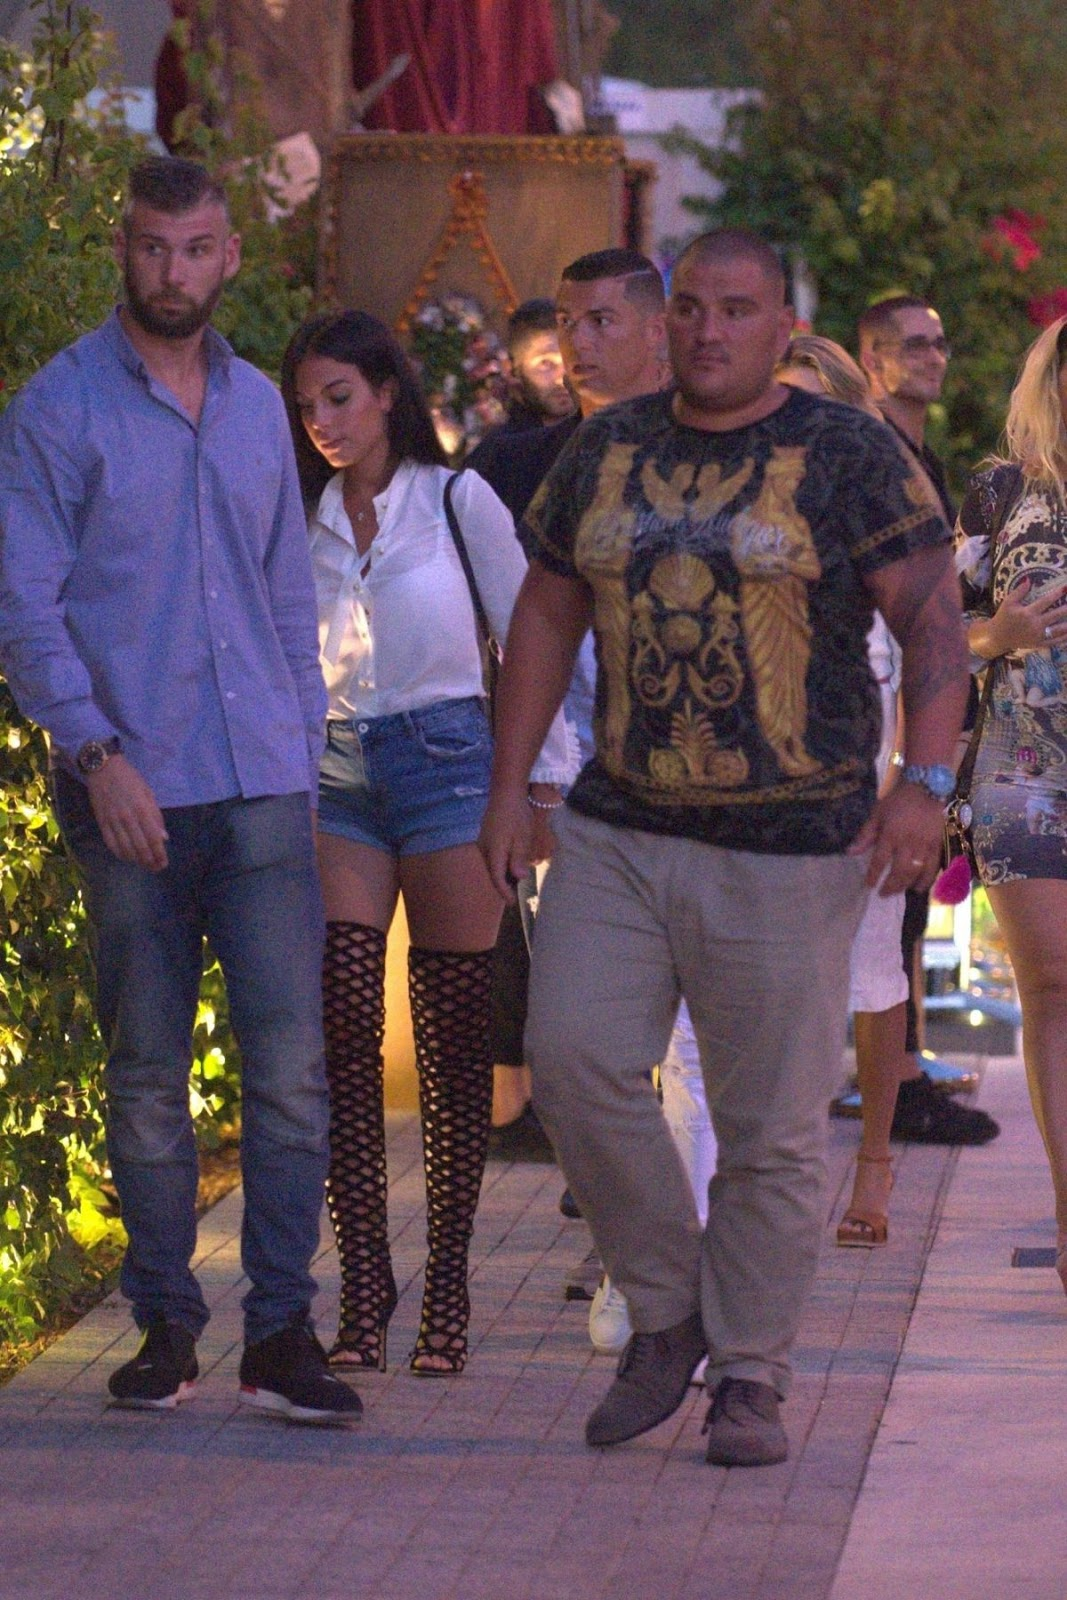 Cristiano Ronaldo Night Out with new girlfriend Georgina Rodriguez in Ibiza